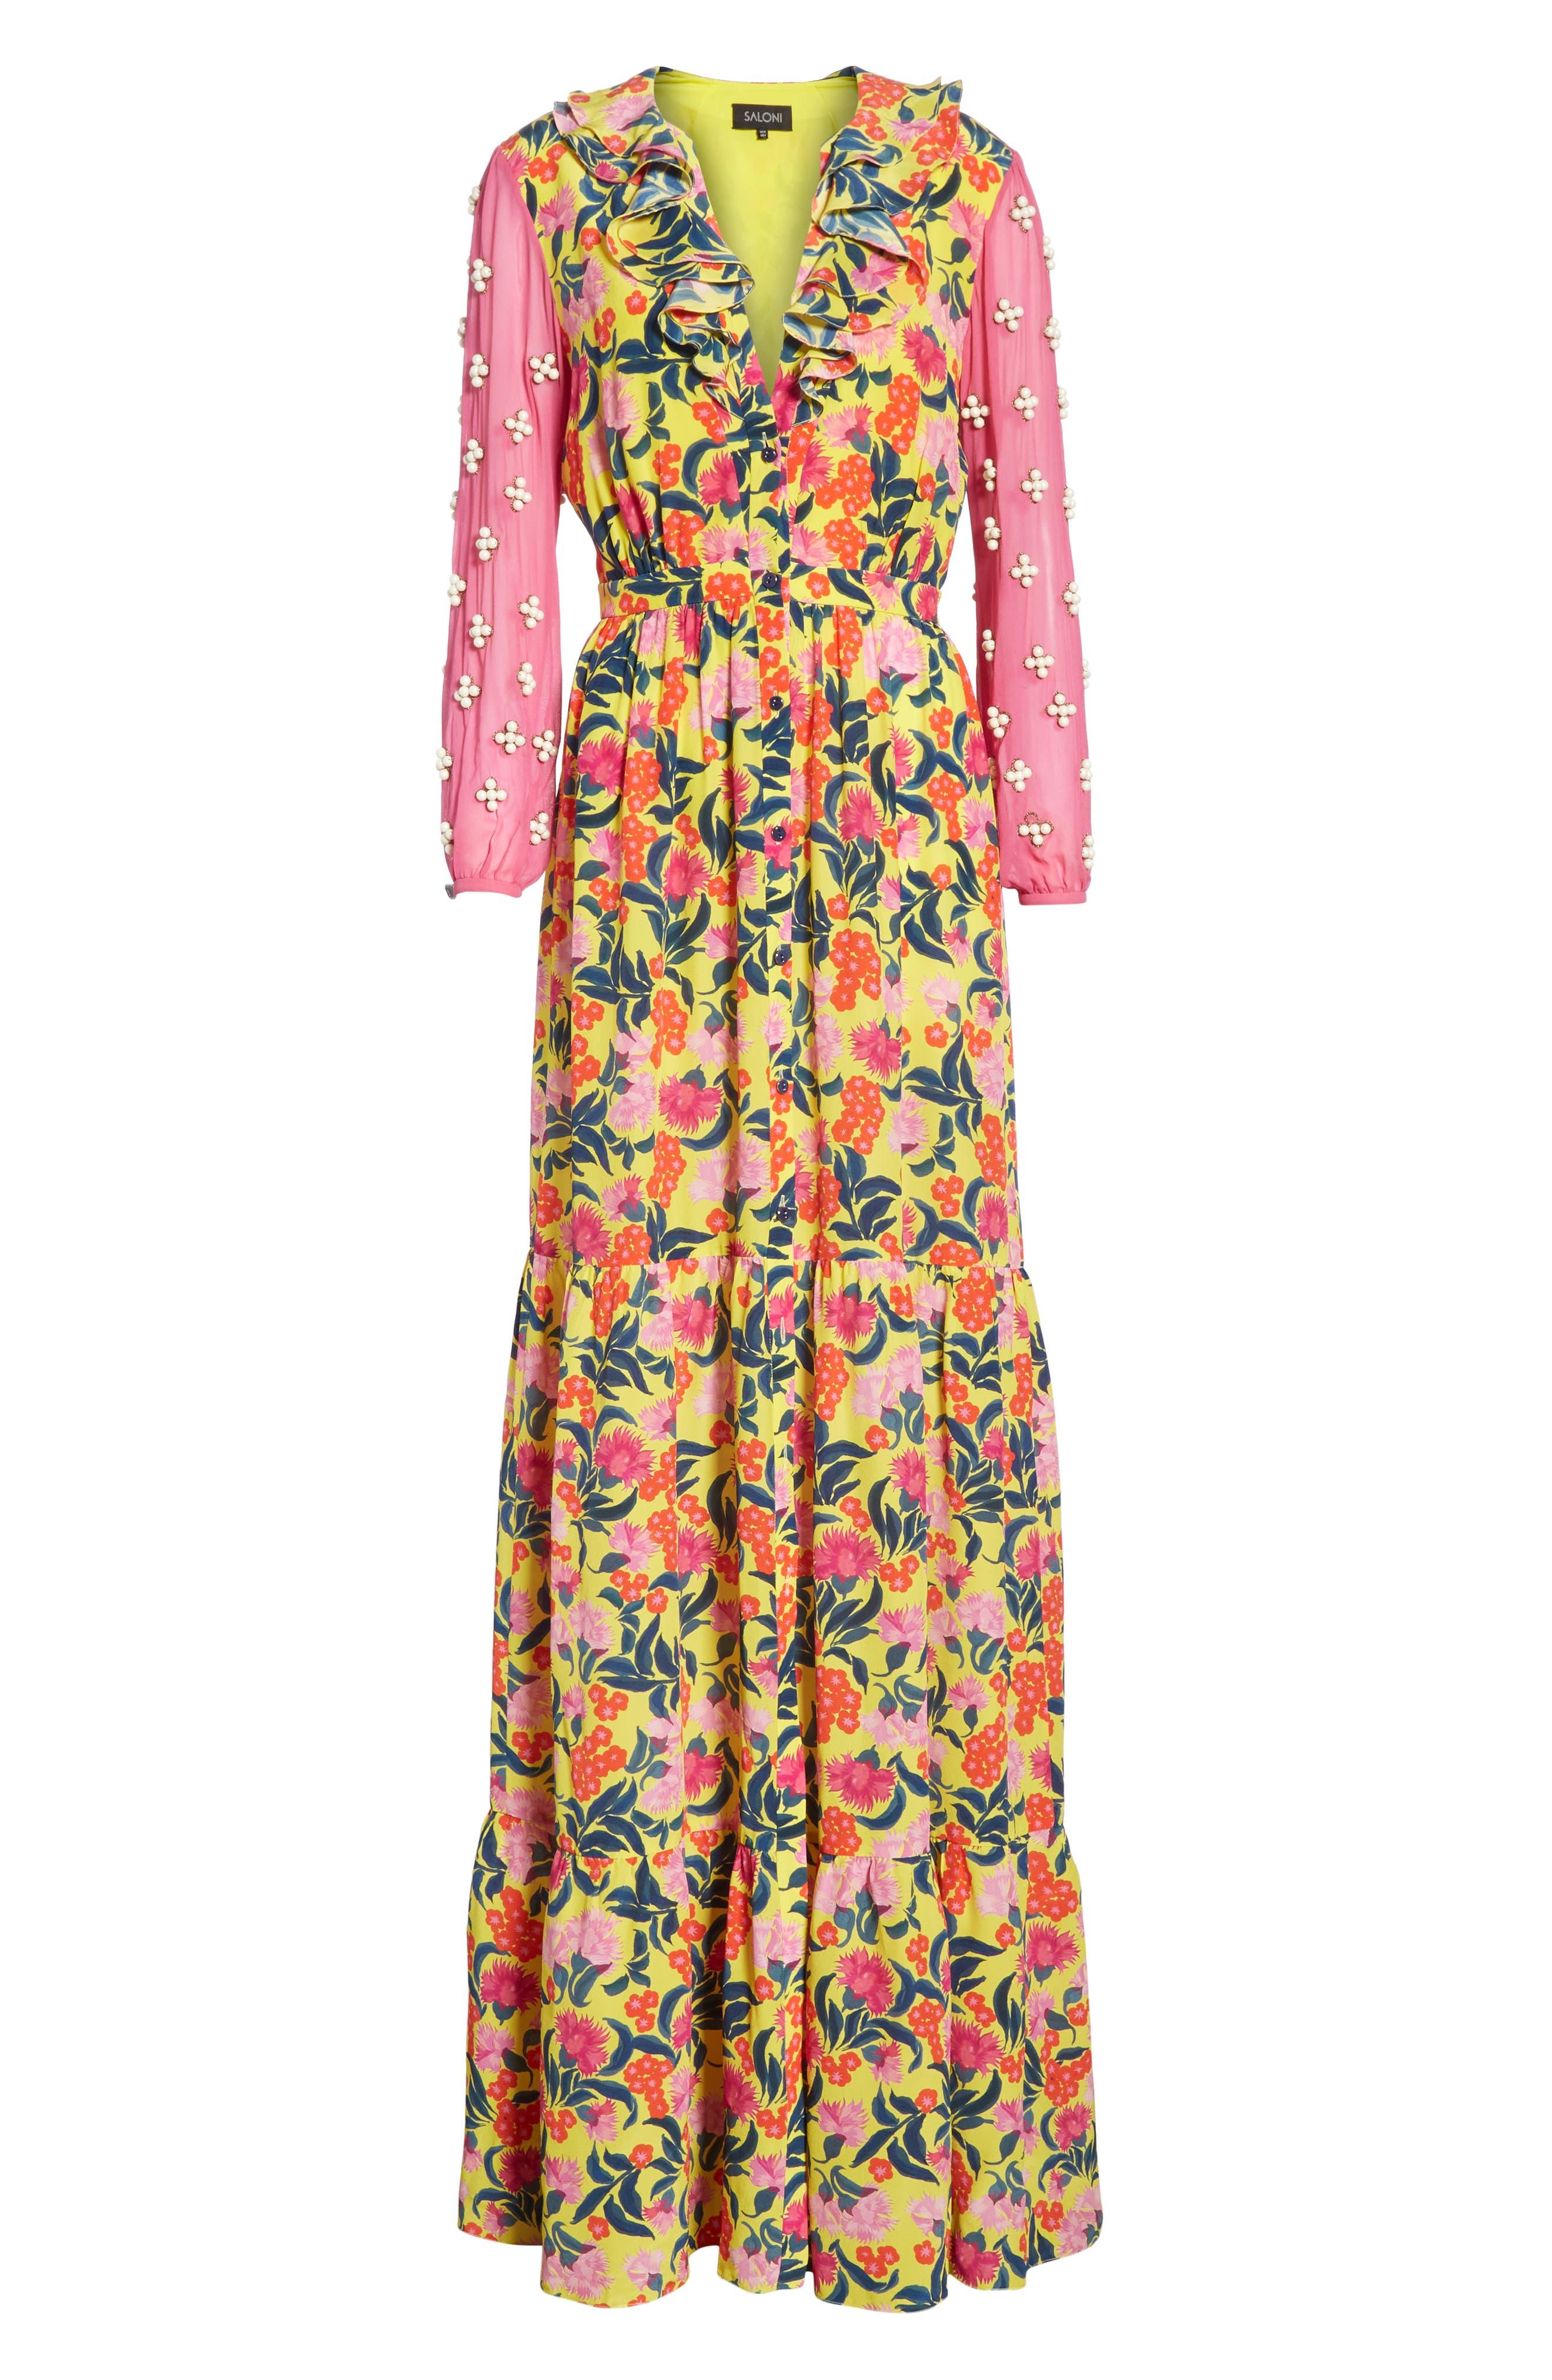 SALONI,                             Ginny Floral Print Embellished Sleeve Silk Dress,                             Alternate thumbnail 6, color,                             720